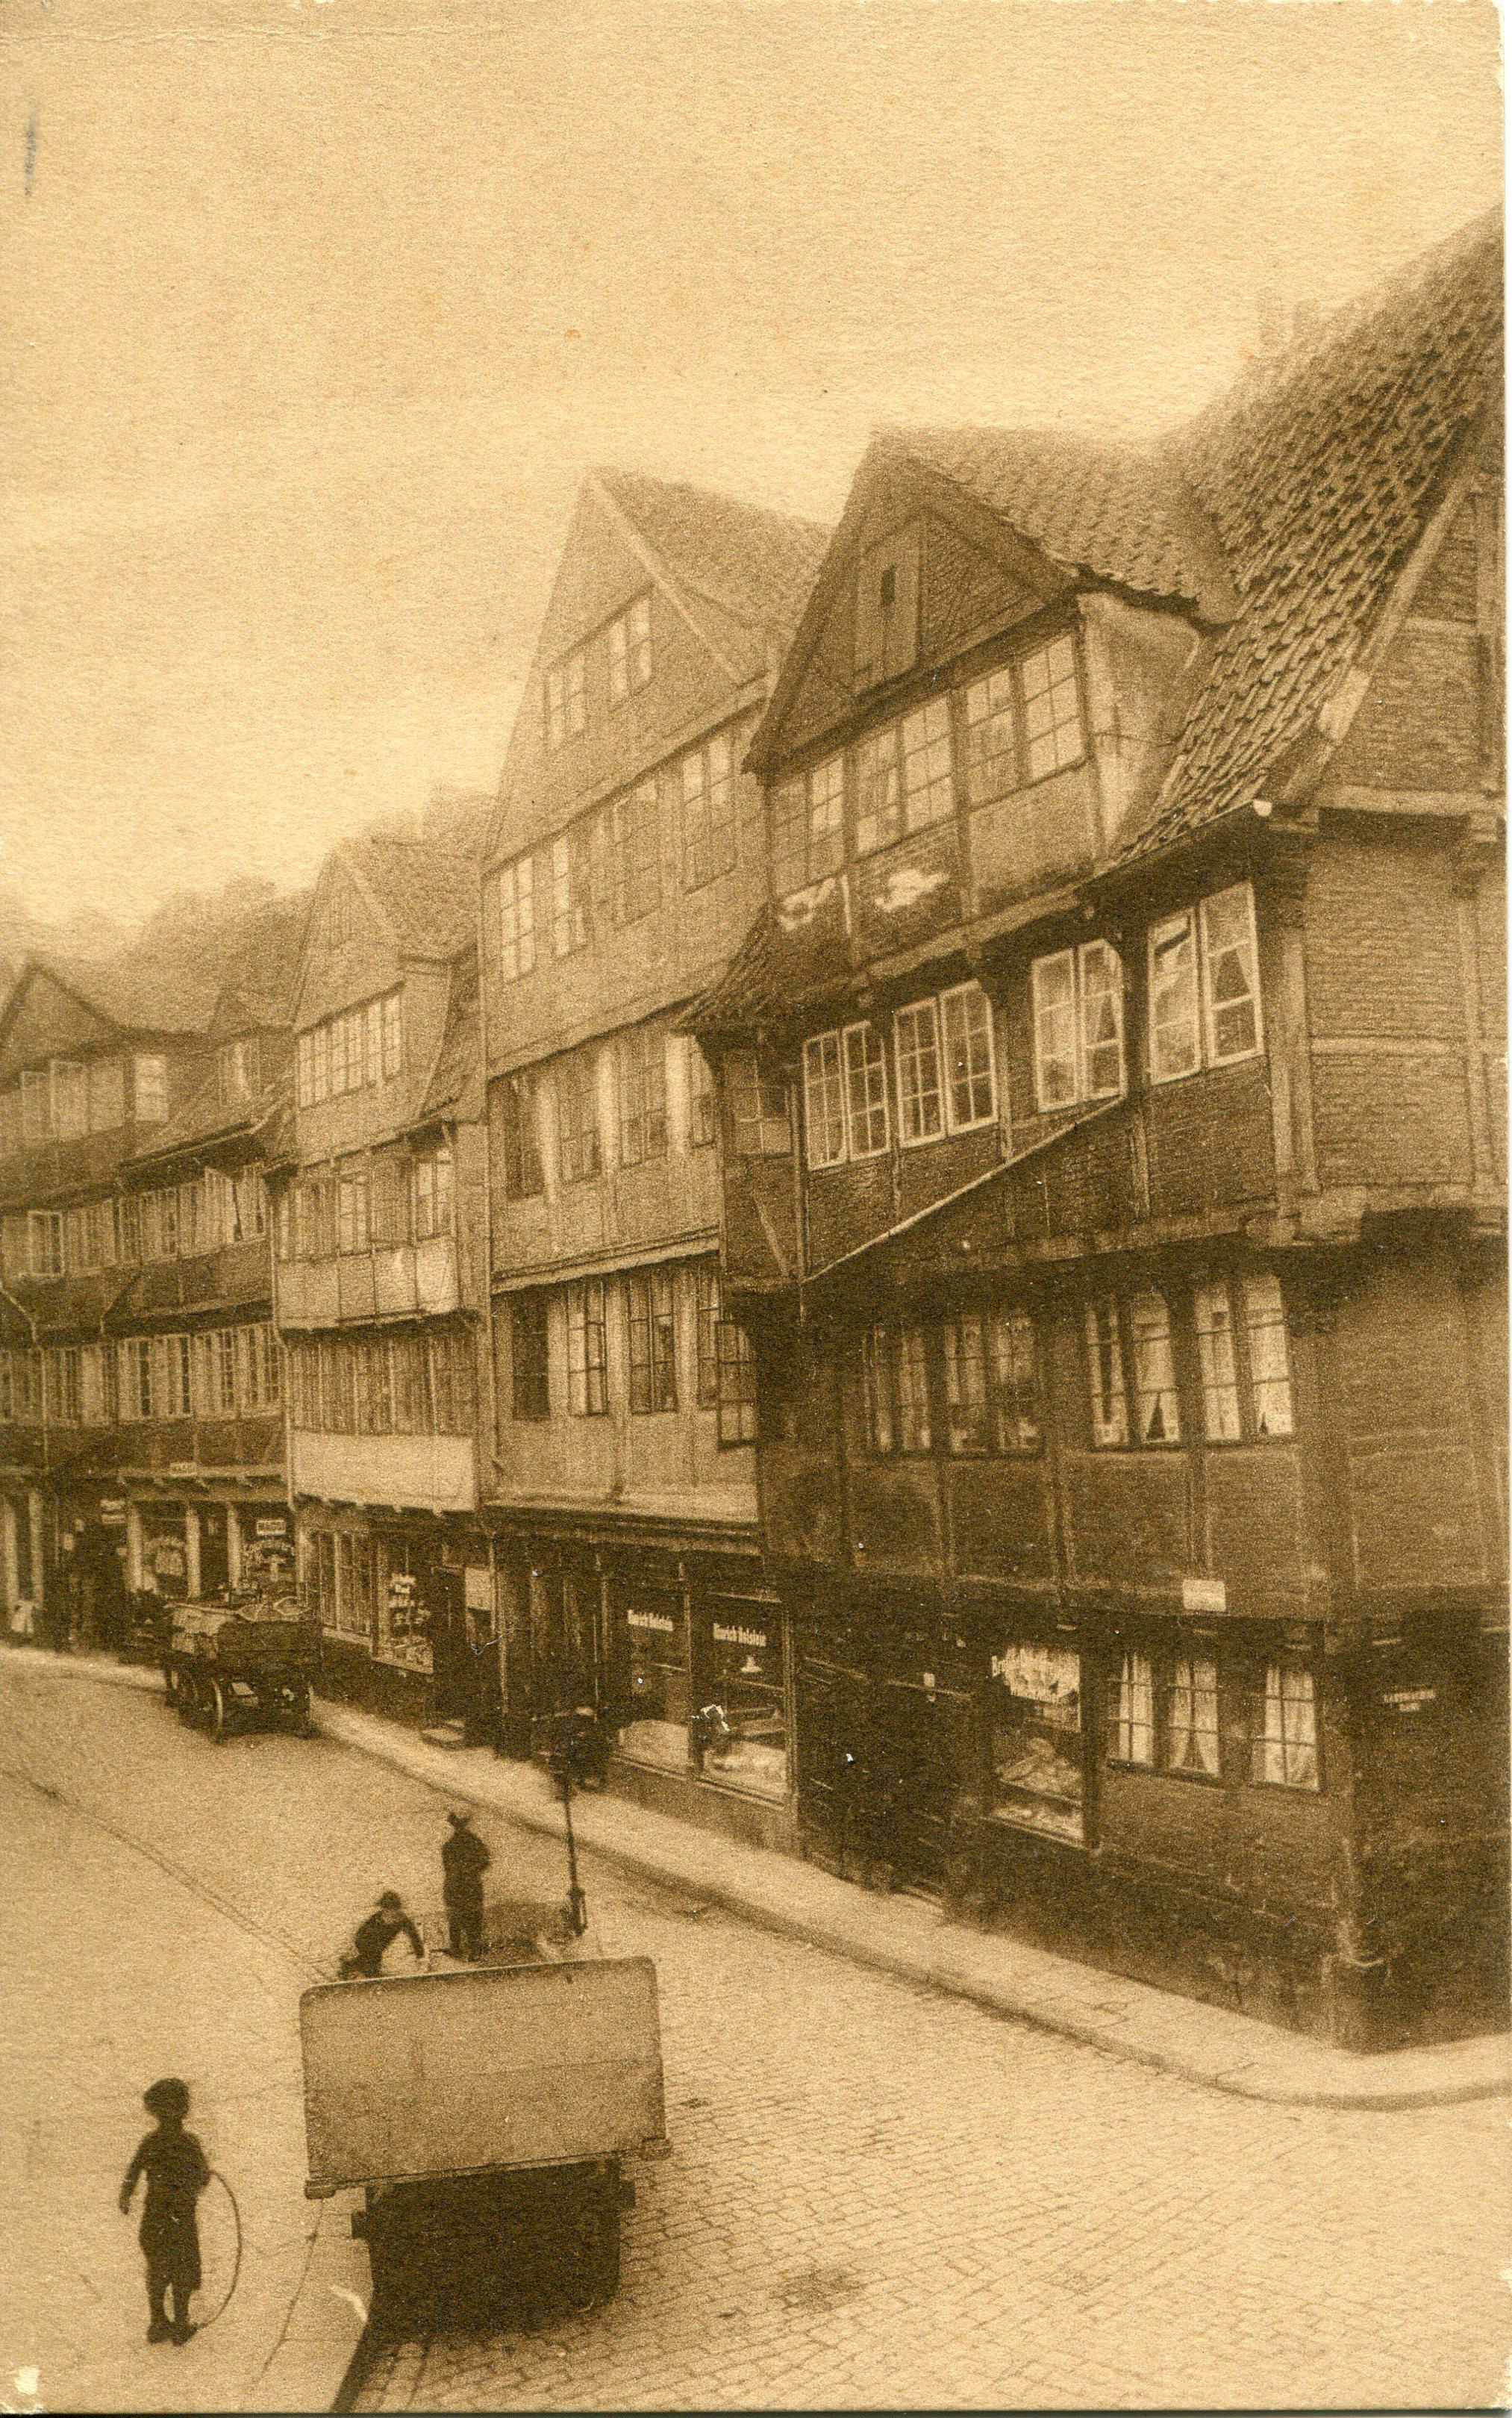 Breiter Gang, Hamburg